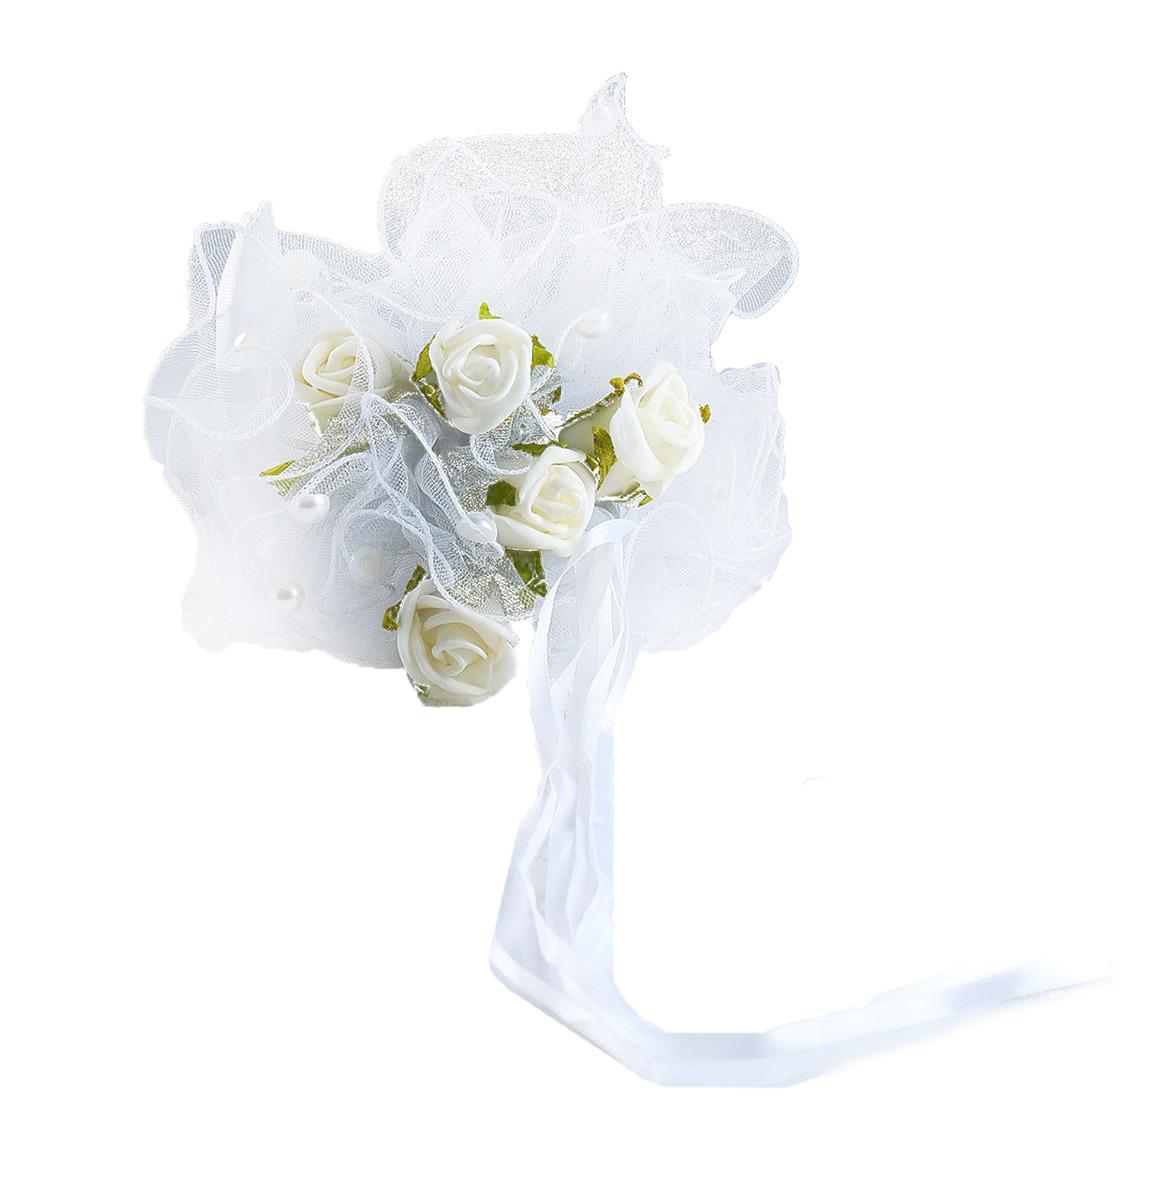 "Букет невесты ""Лучший день"", 2569687, белый, желтый"